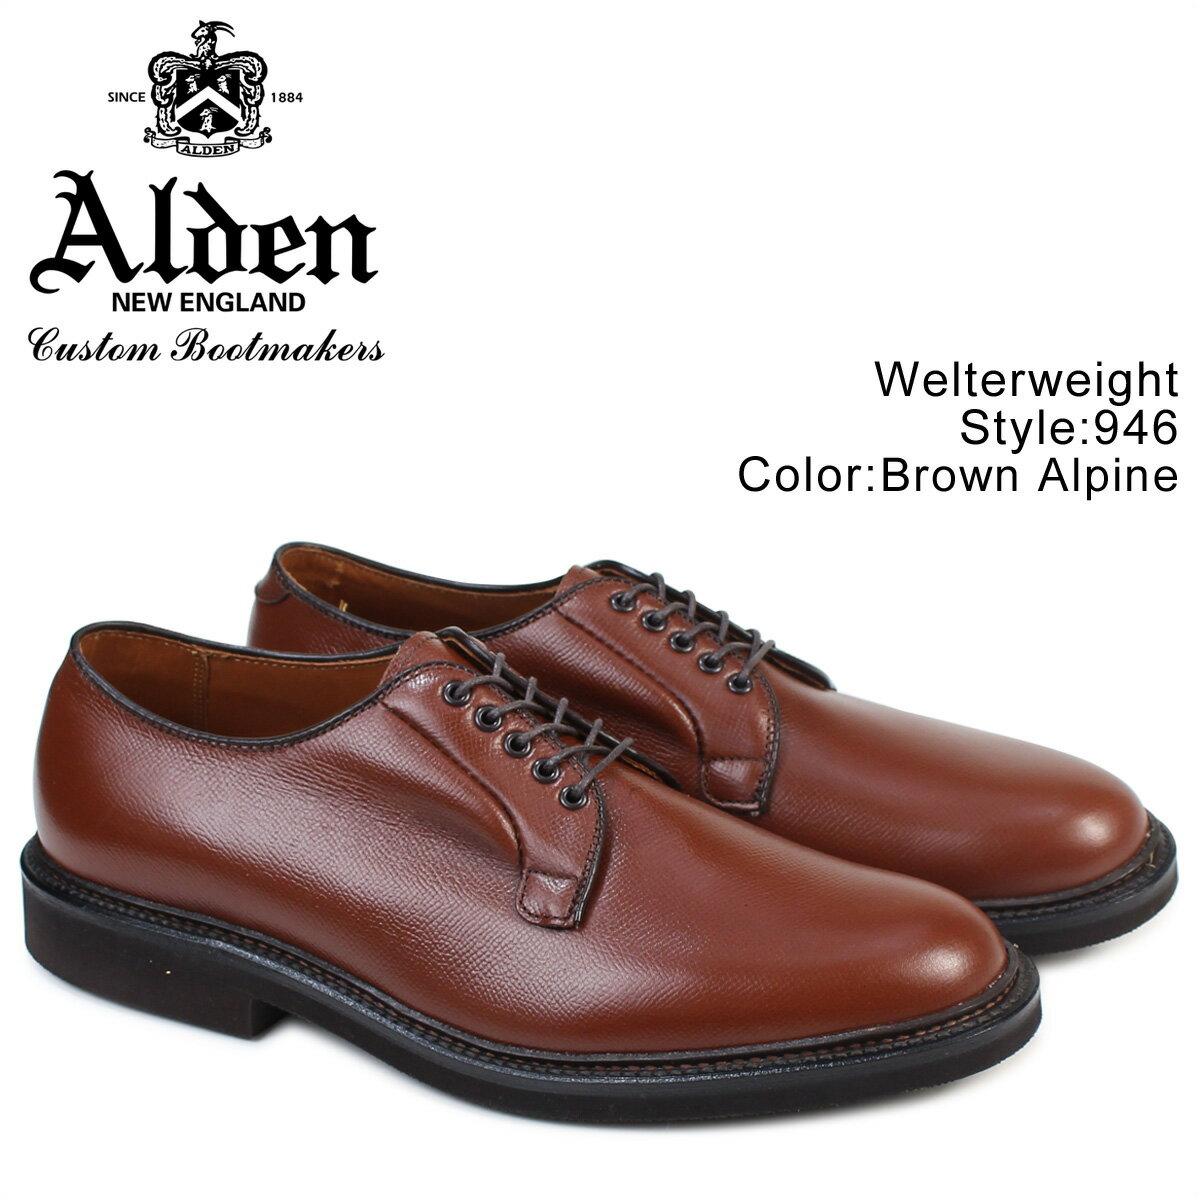 ALDEN オールデン シューズ メンズ  WELTERWEIGHT Dワイズ  946:スニークオンラインショップ